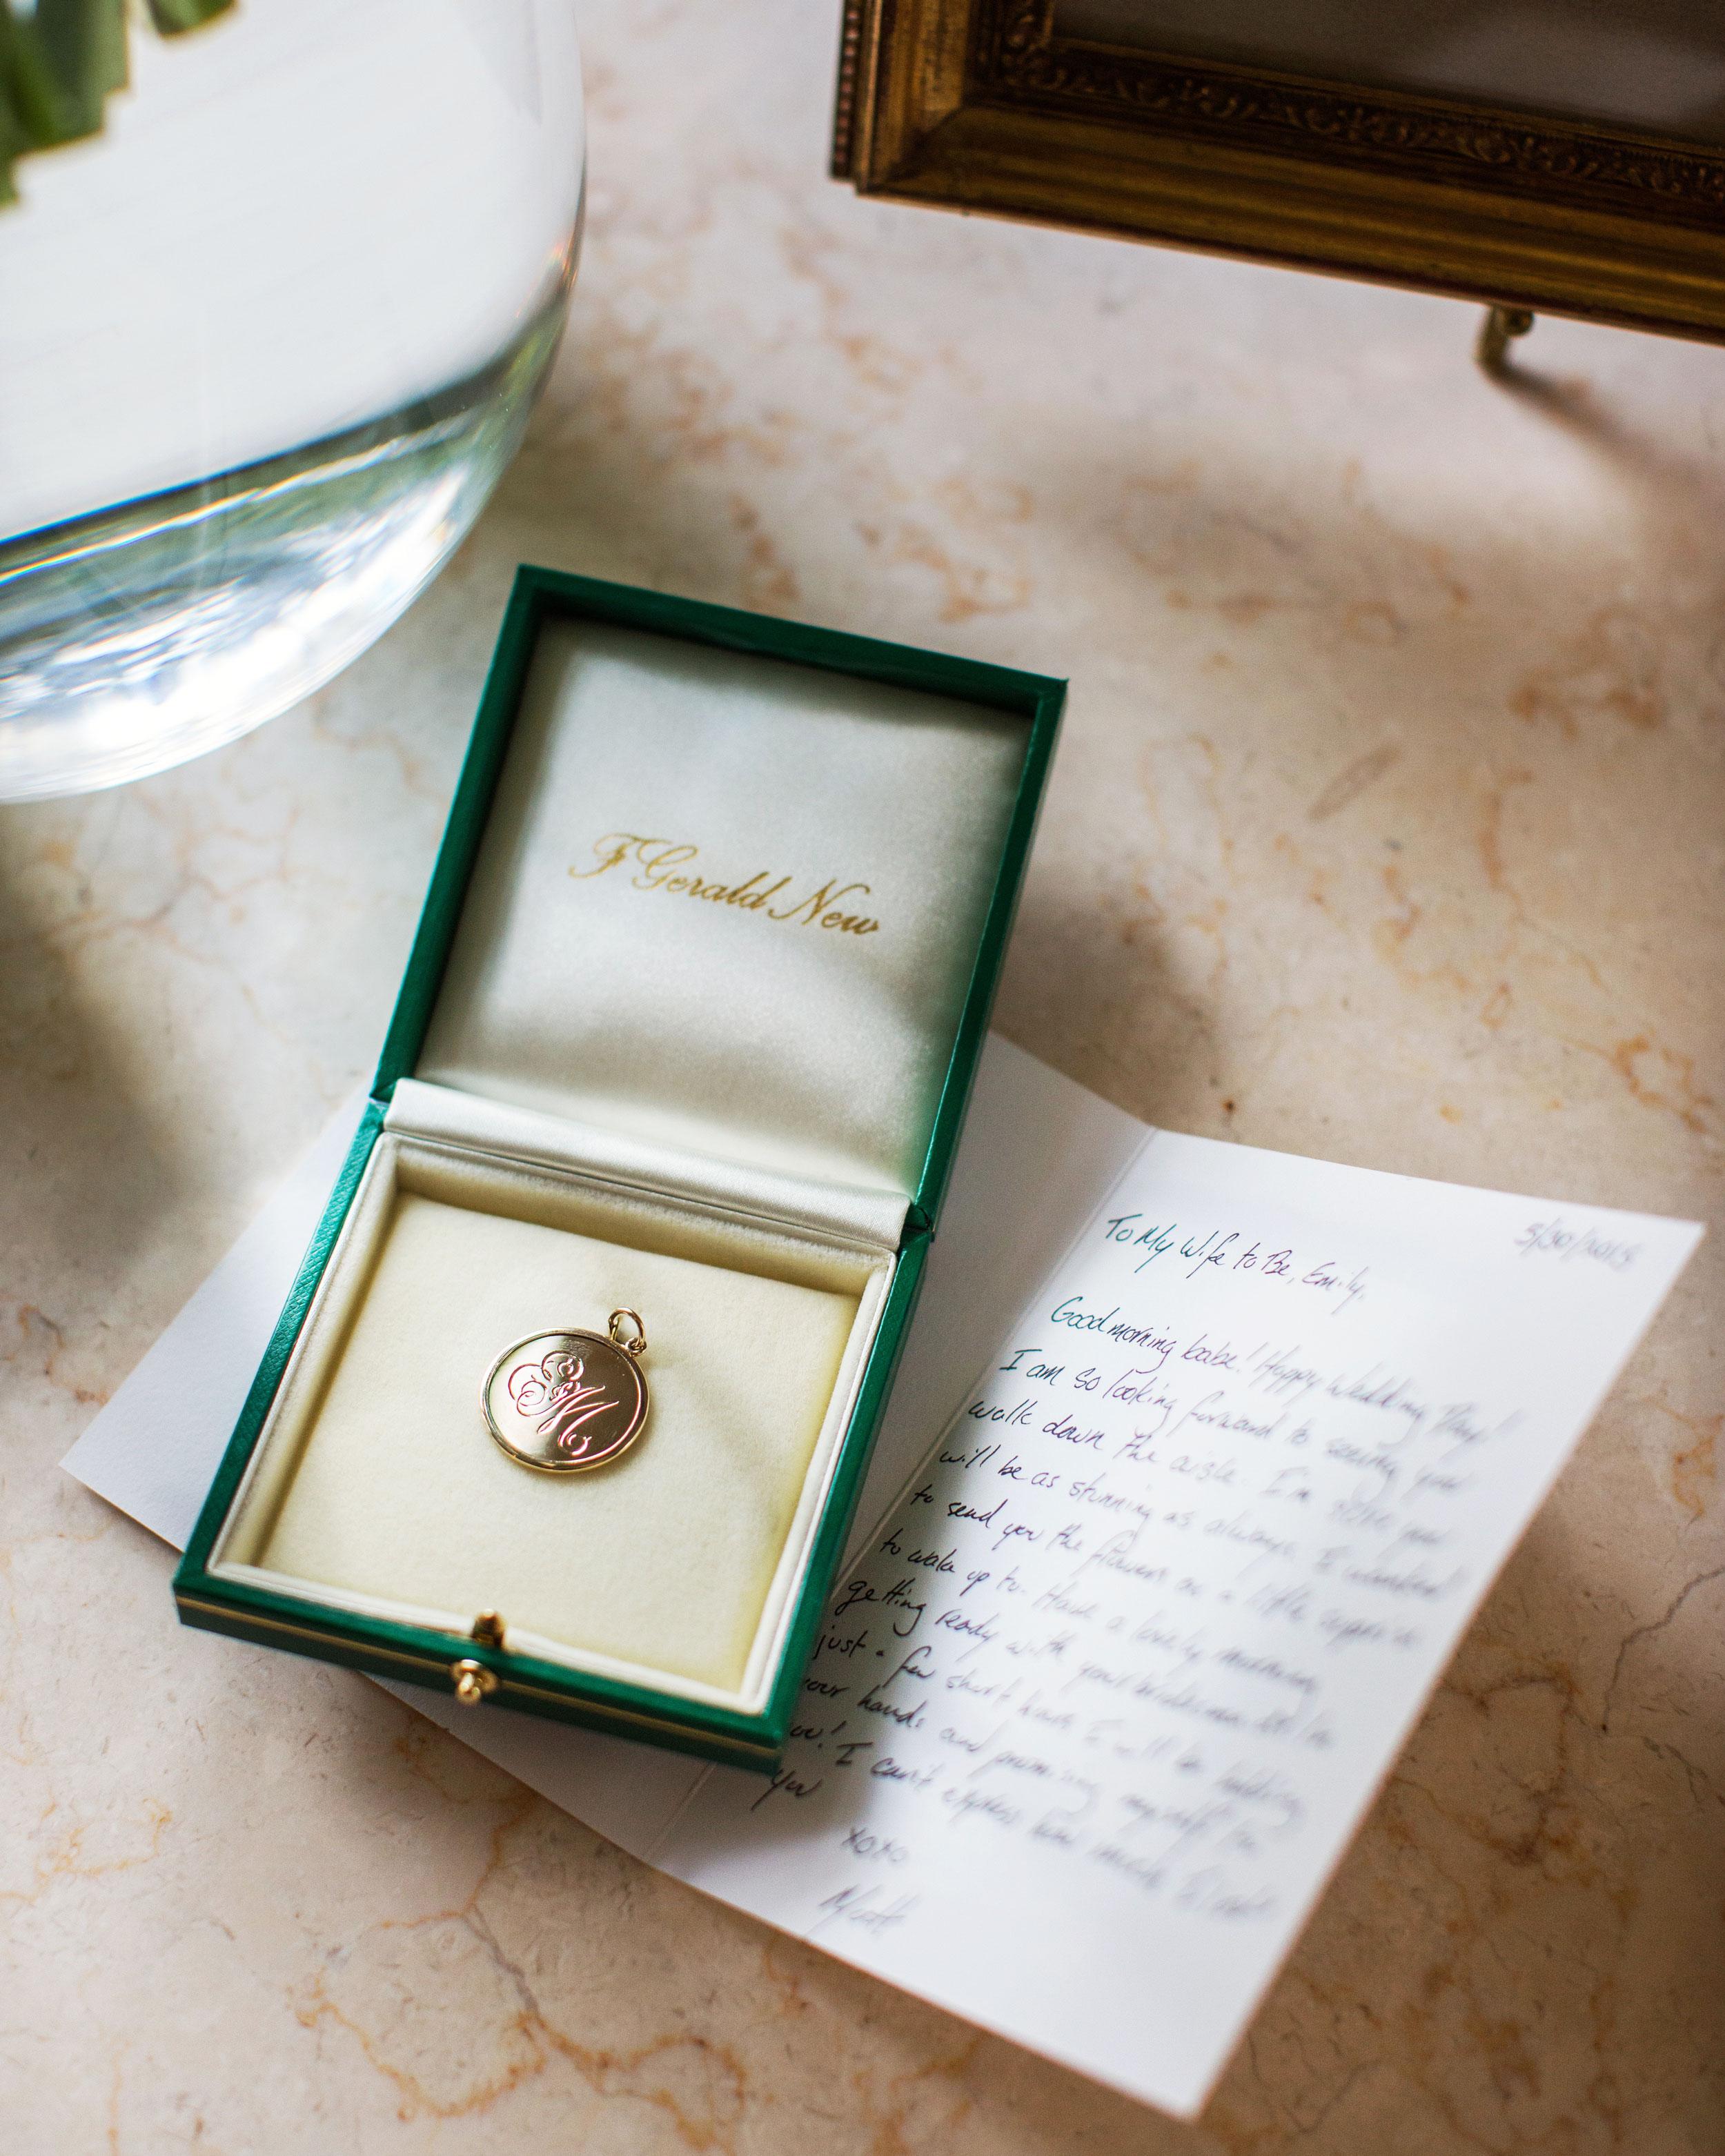 emily-matthew-wedding-charm-0008-s112720-0316.jpg